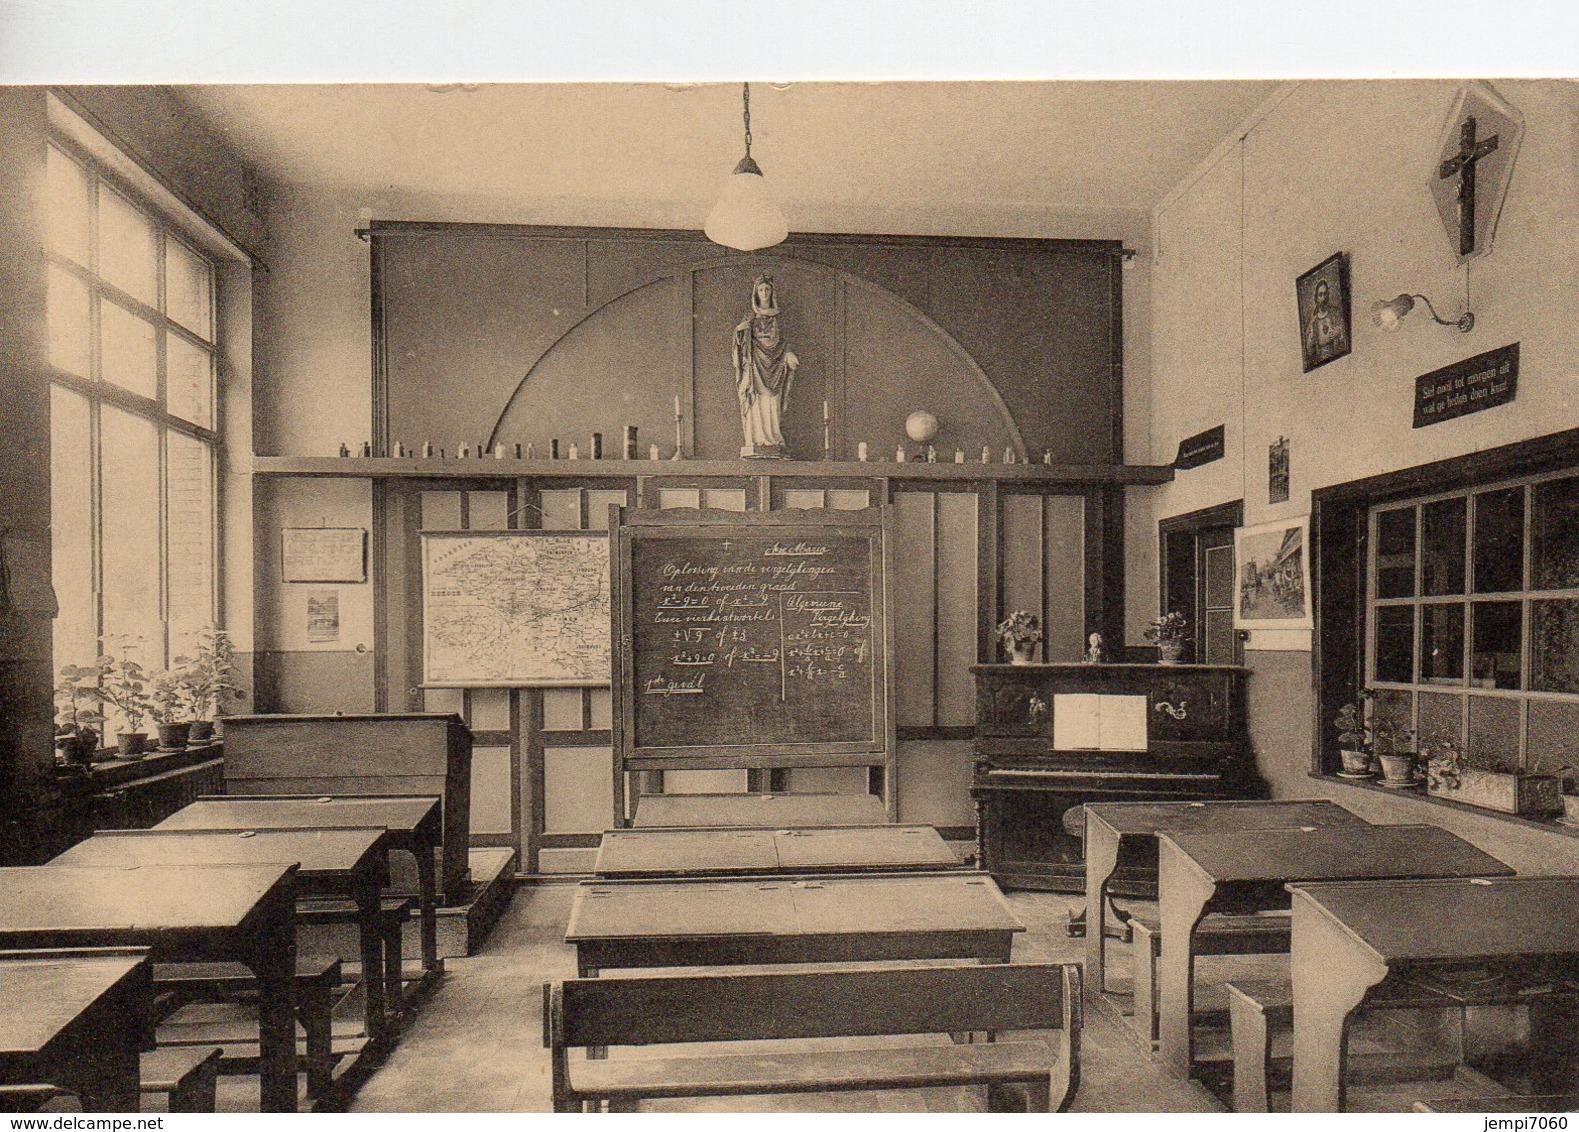 AALST - ALOST : Juvenaat Der Congregatie Van Den H.Johannus De Deo/ Juvénat De La Congrégation De Saint Jean De Dieu - Aalst